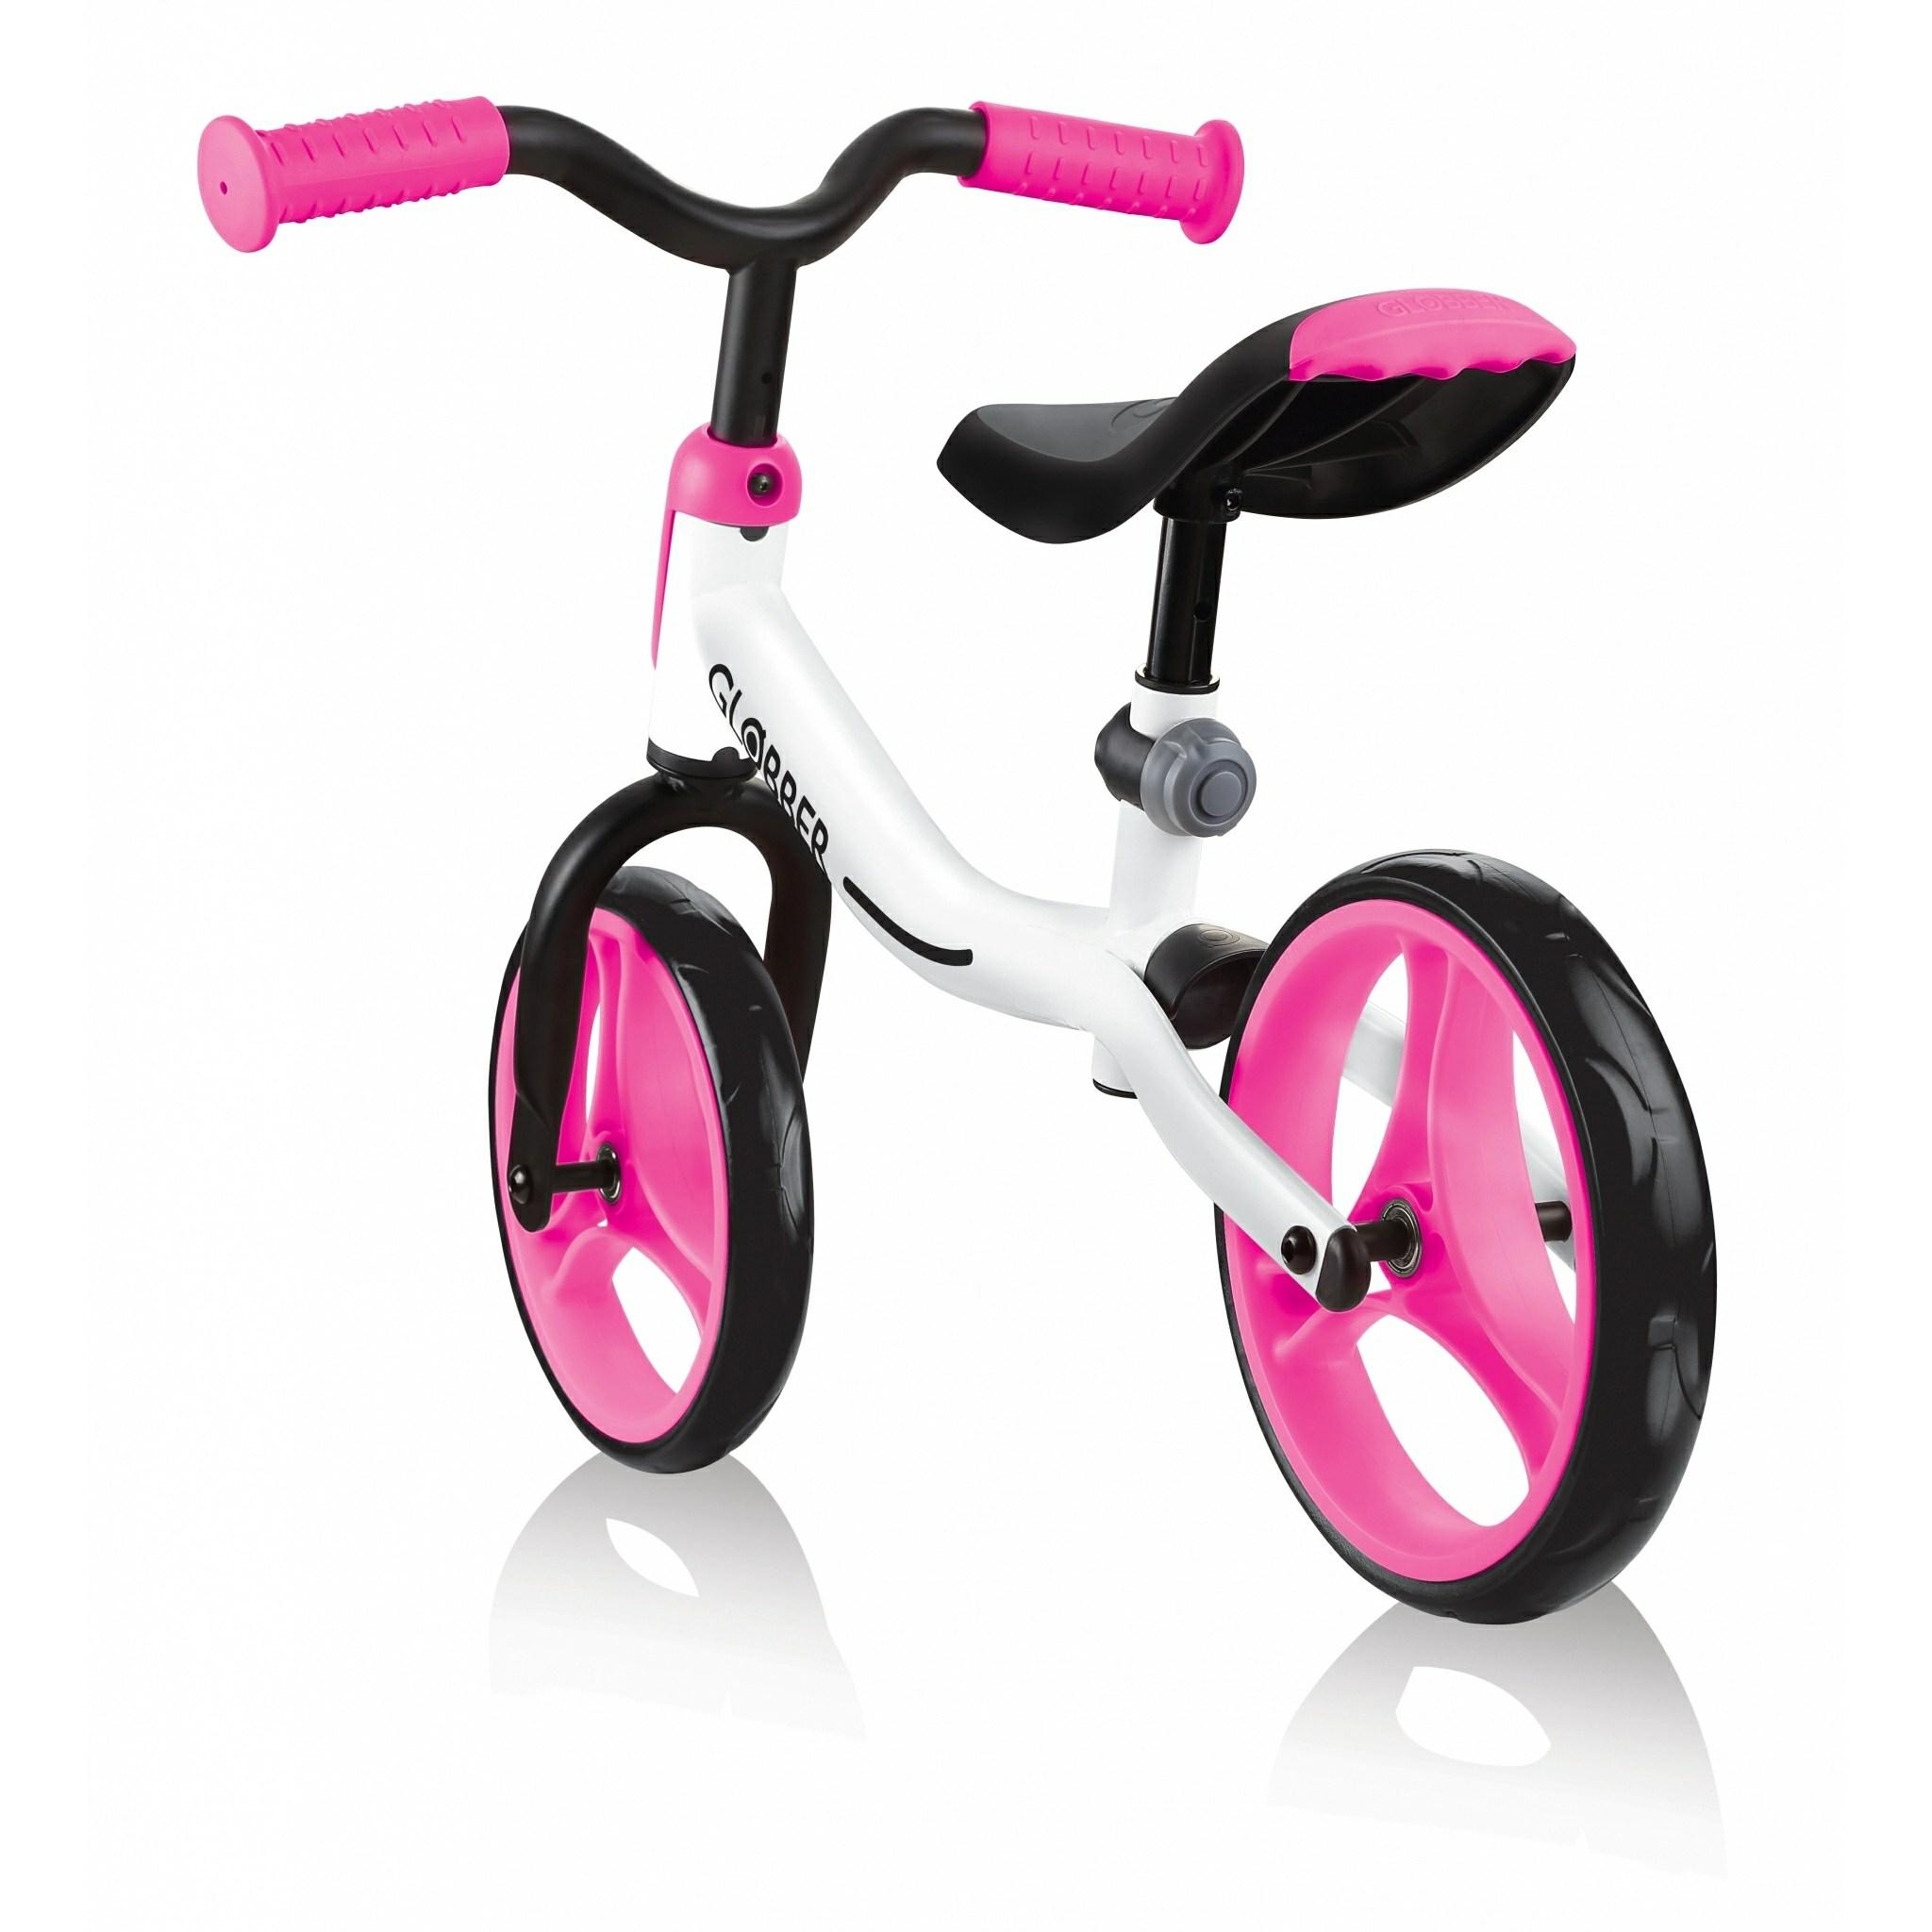 Globber GO BIKE balance bike for kids (boys and girls) aged 2 to 5 years old; adjustable toddler bike.